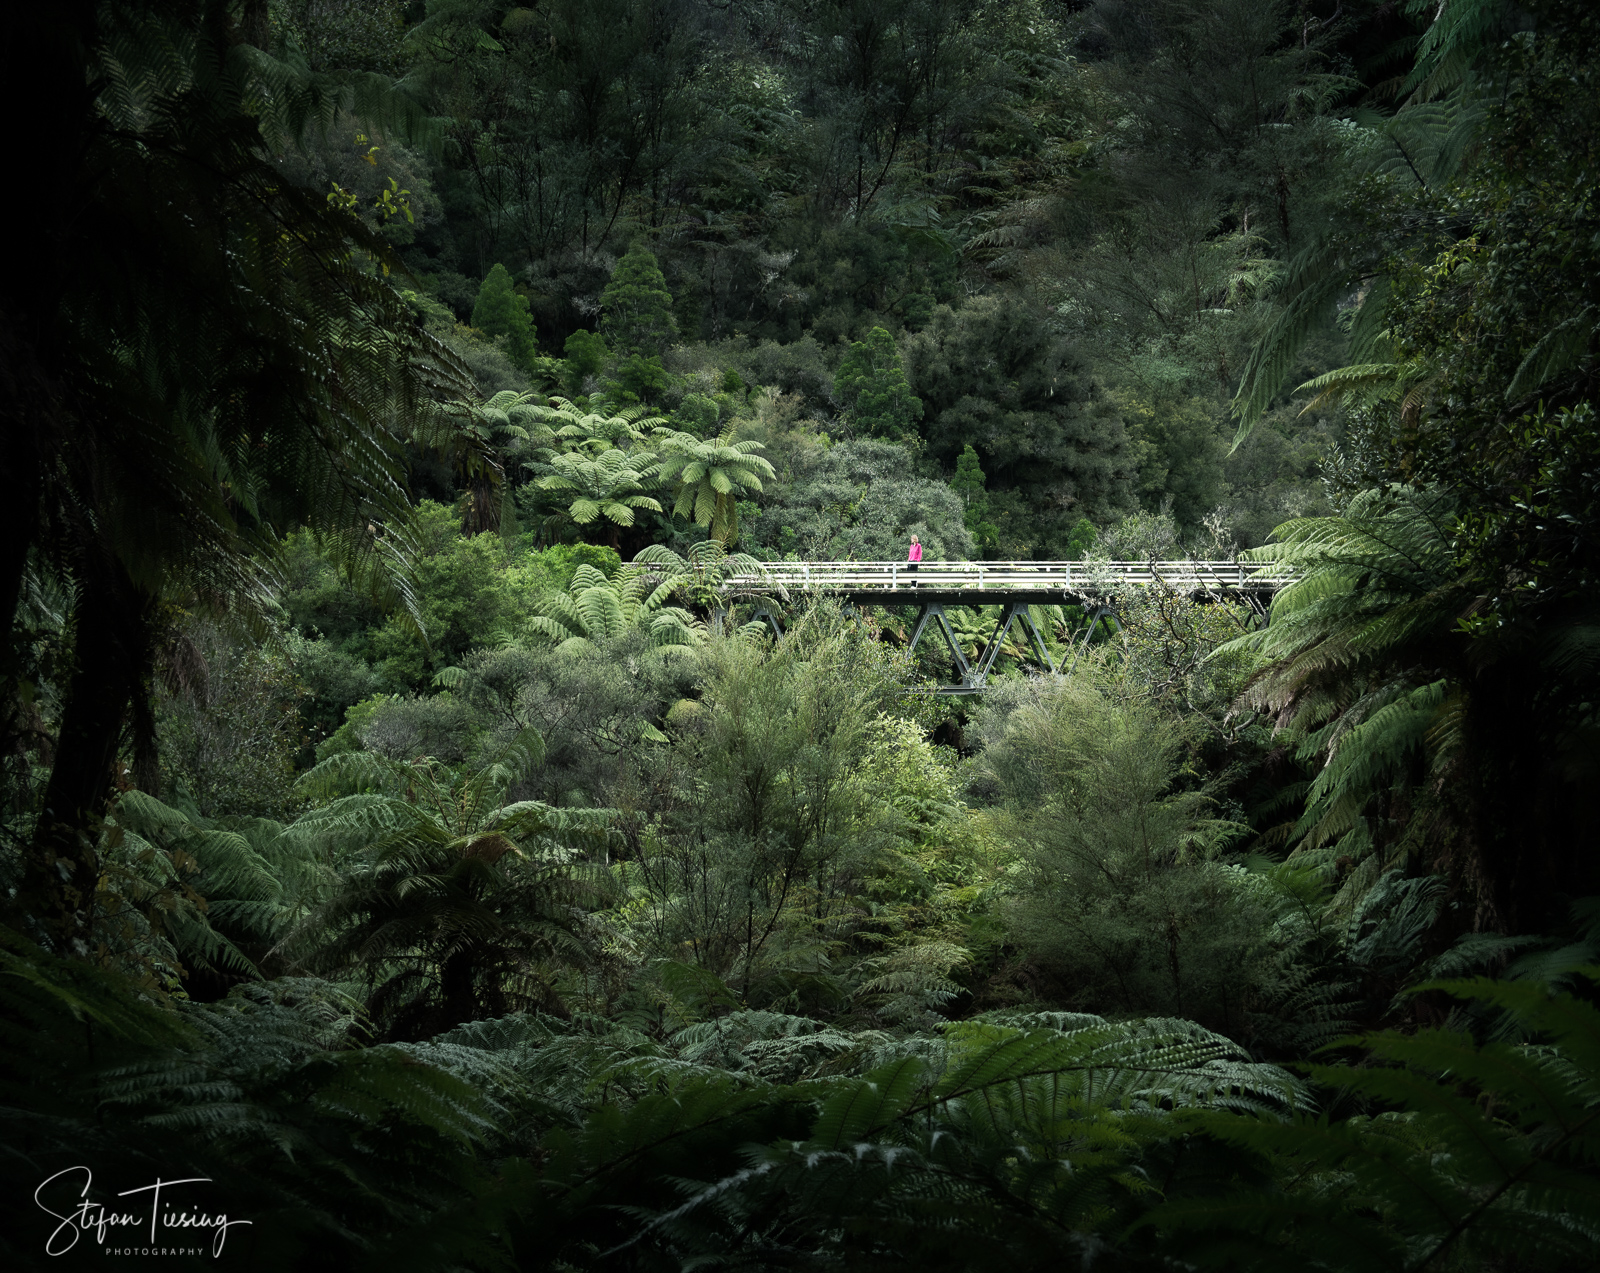 Tangarakau Bridge in Neuseeland